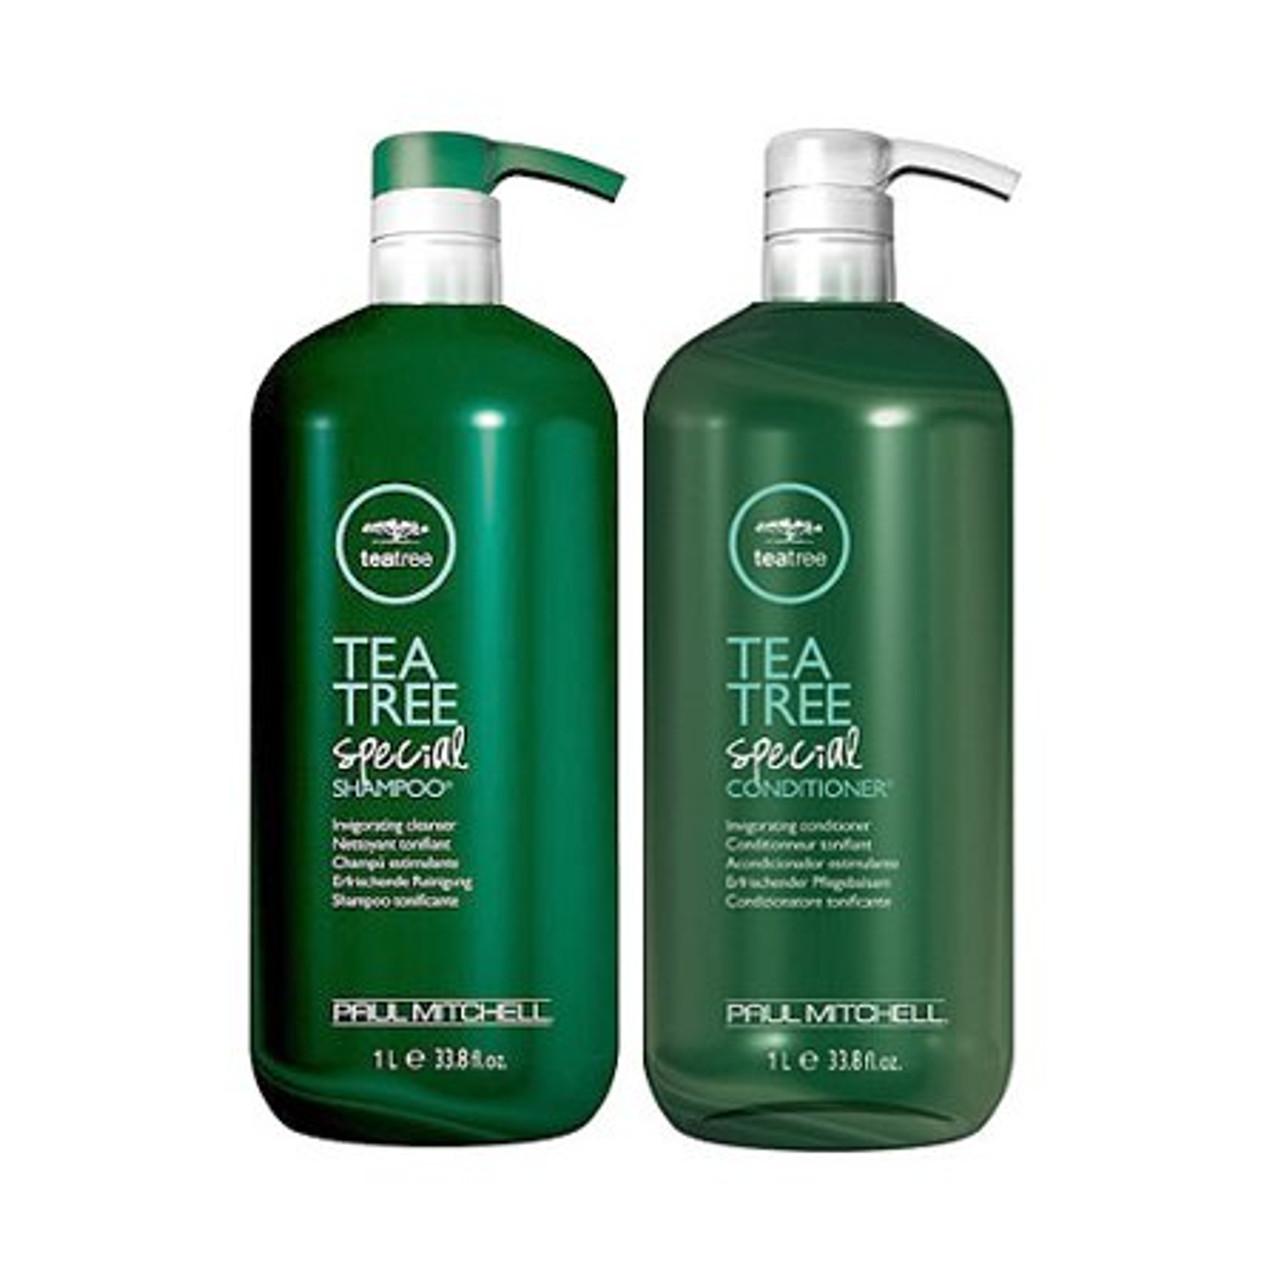 Paul Mitchell Tea Tree Liter Duo